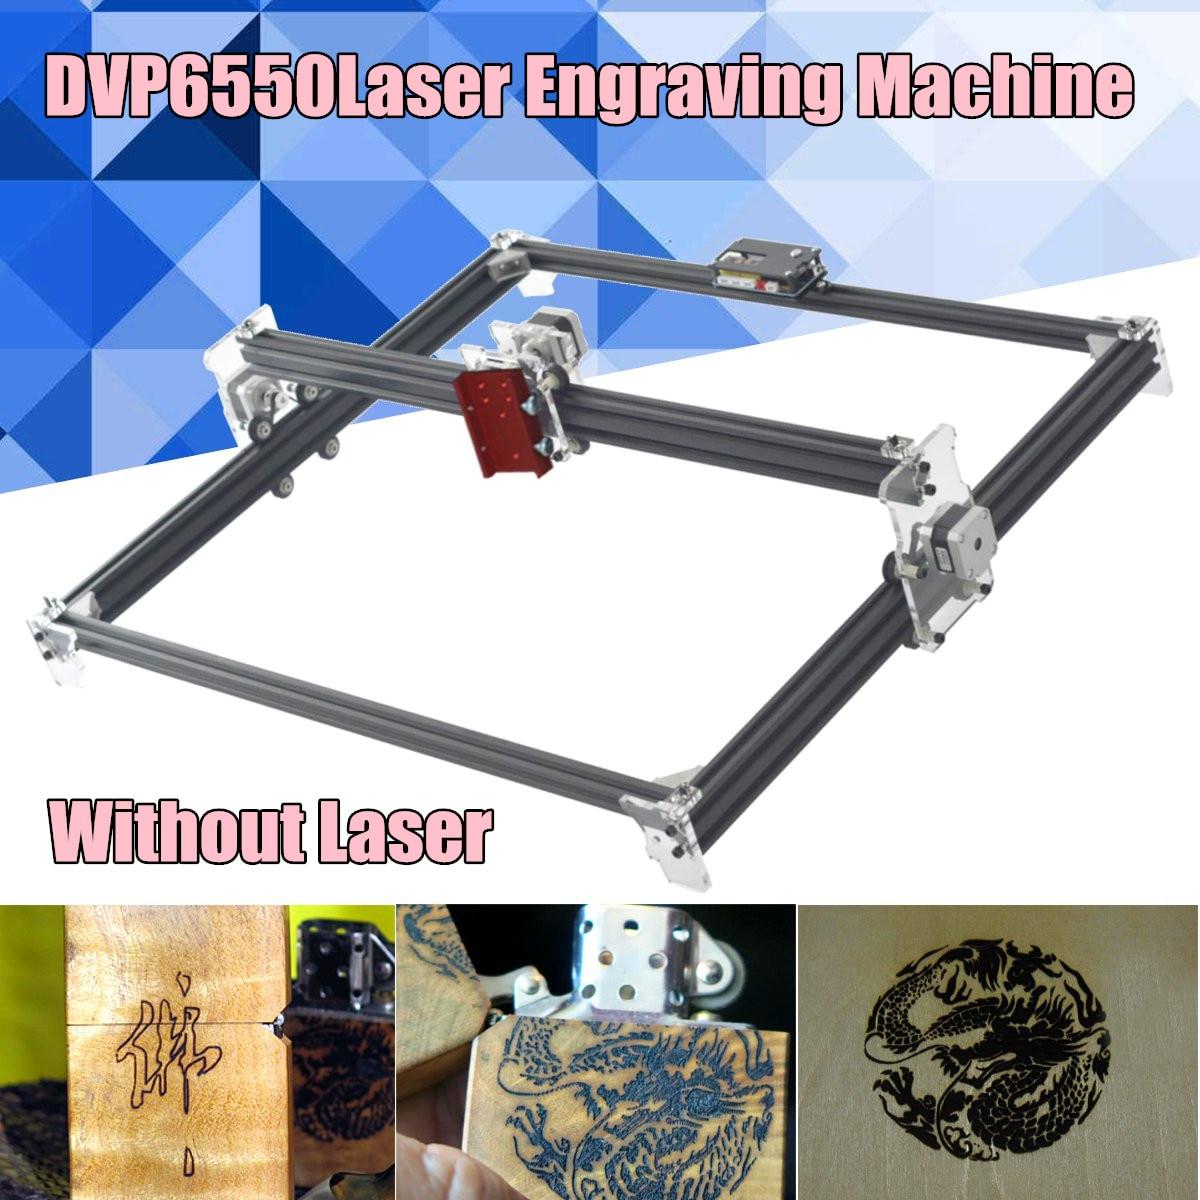 65x50cm 2Axis Laser Engraving Cutting Machine Engraver CNC Desktop CNC Router Best Advanced Toys Without Laser